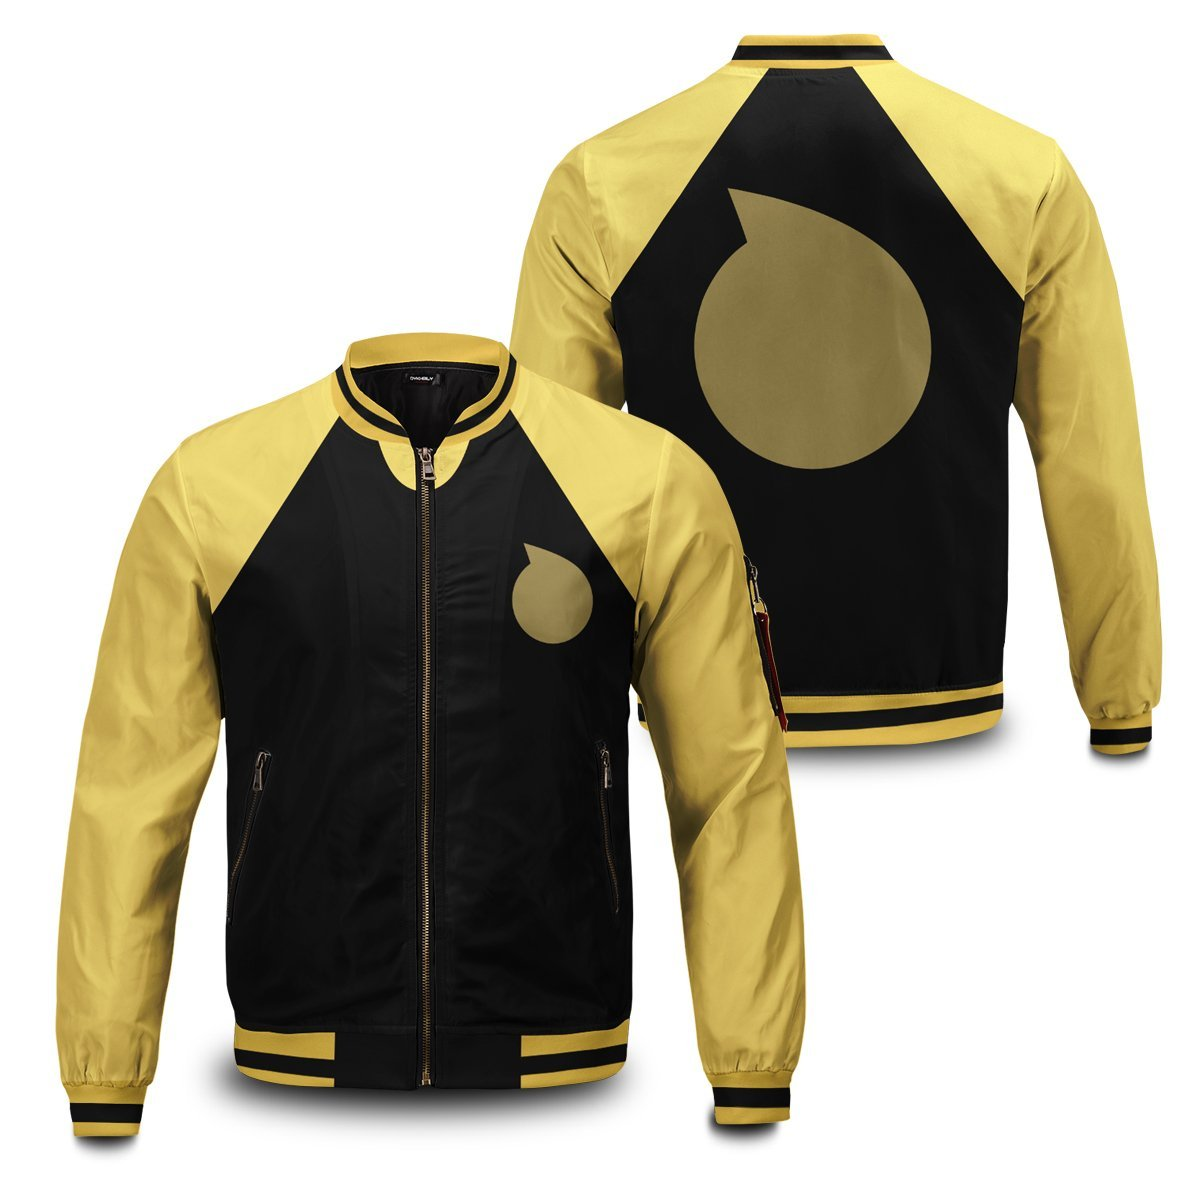 soul eater evans bomber jacket 203044 - Anime Jacket